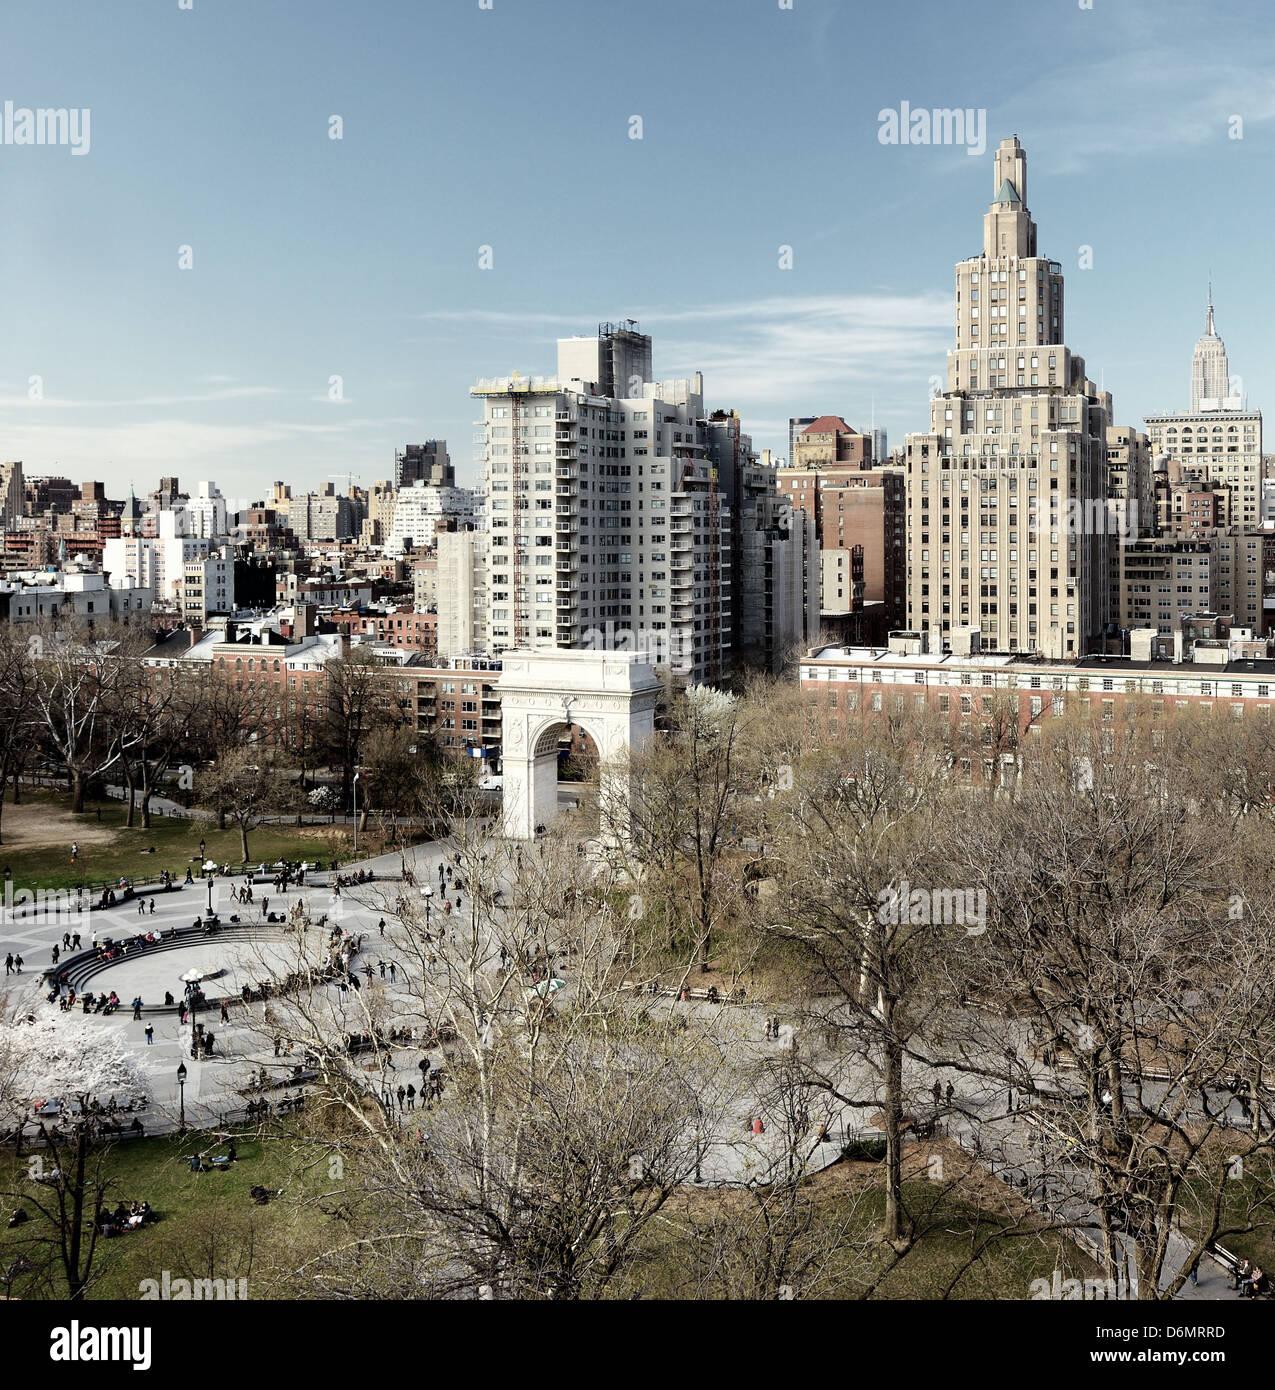 Washington Square Park in New York City - Stock Image